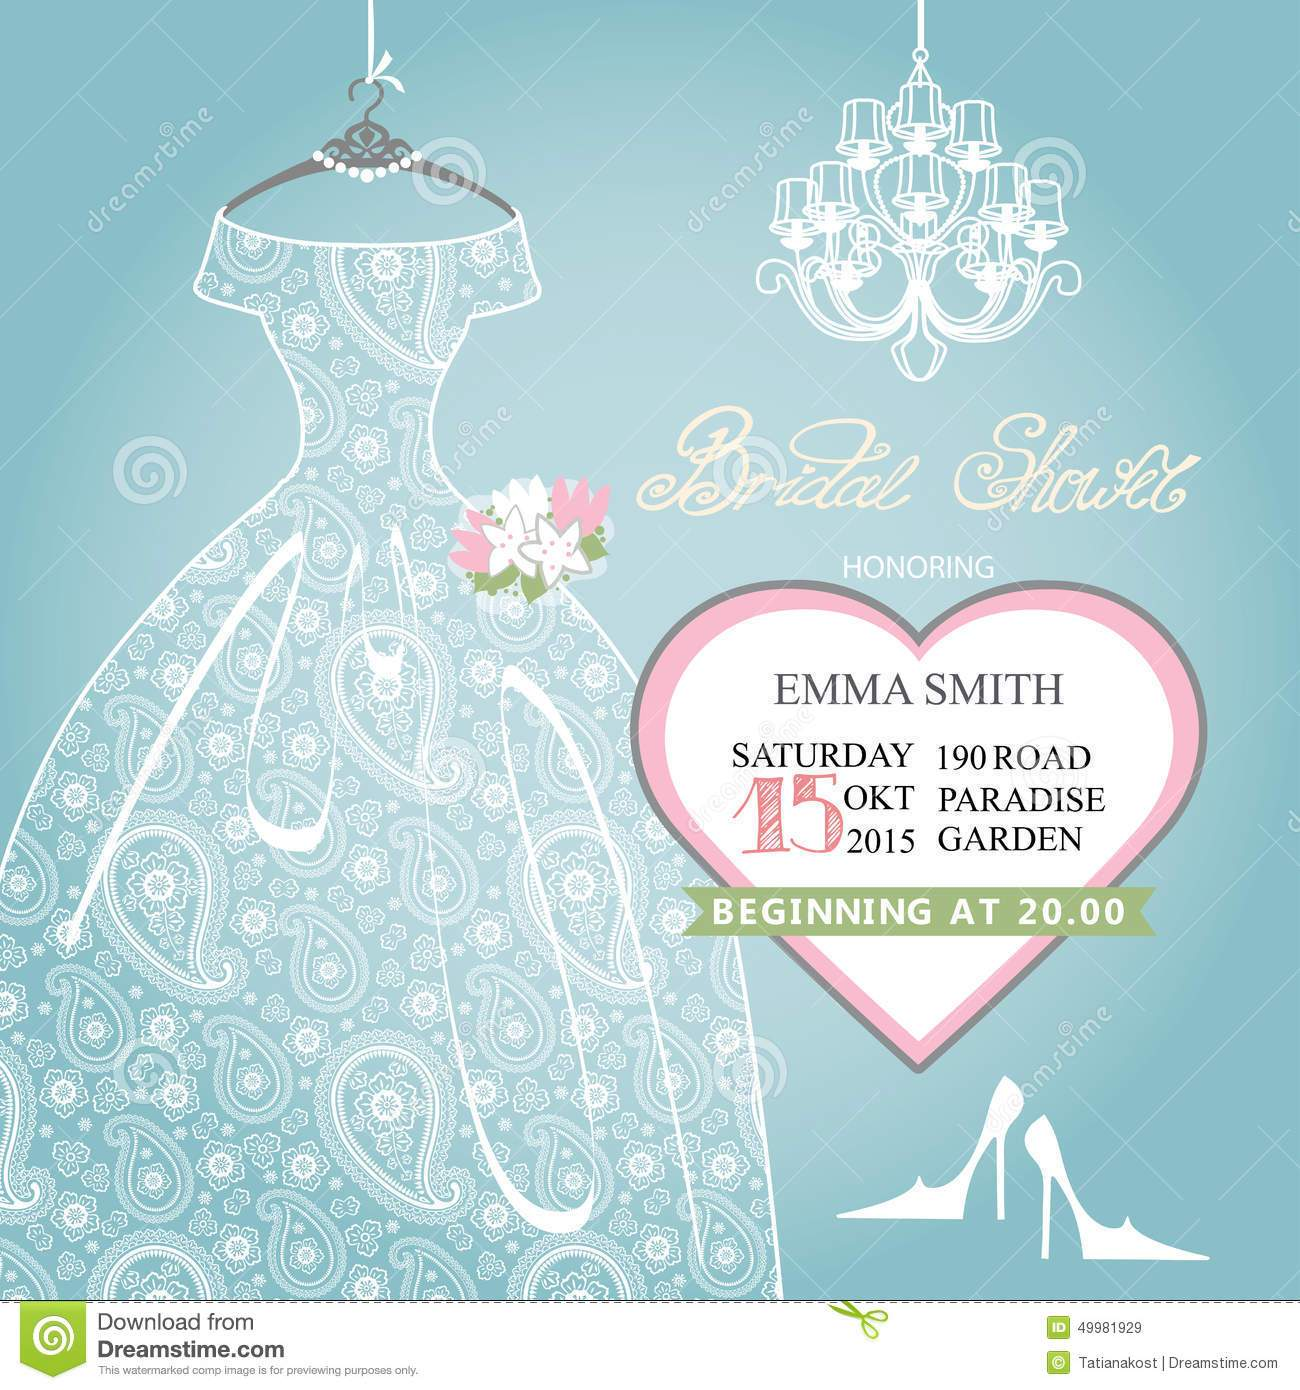 Clipart for bridal shower invitations 2 » Clipart Portal.